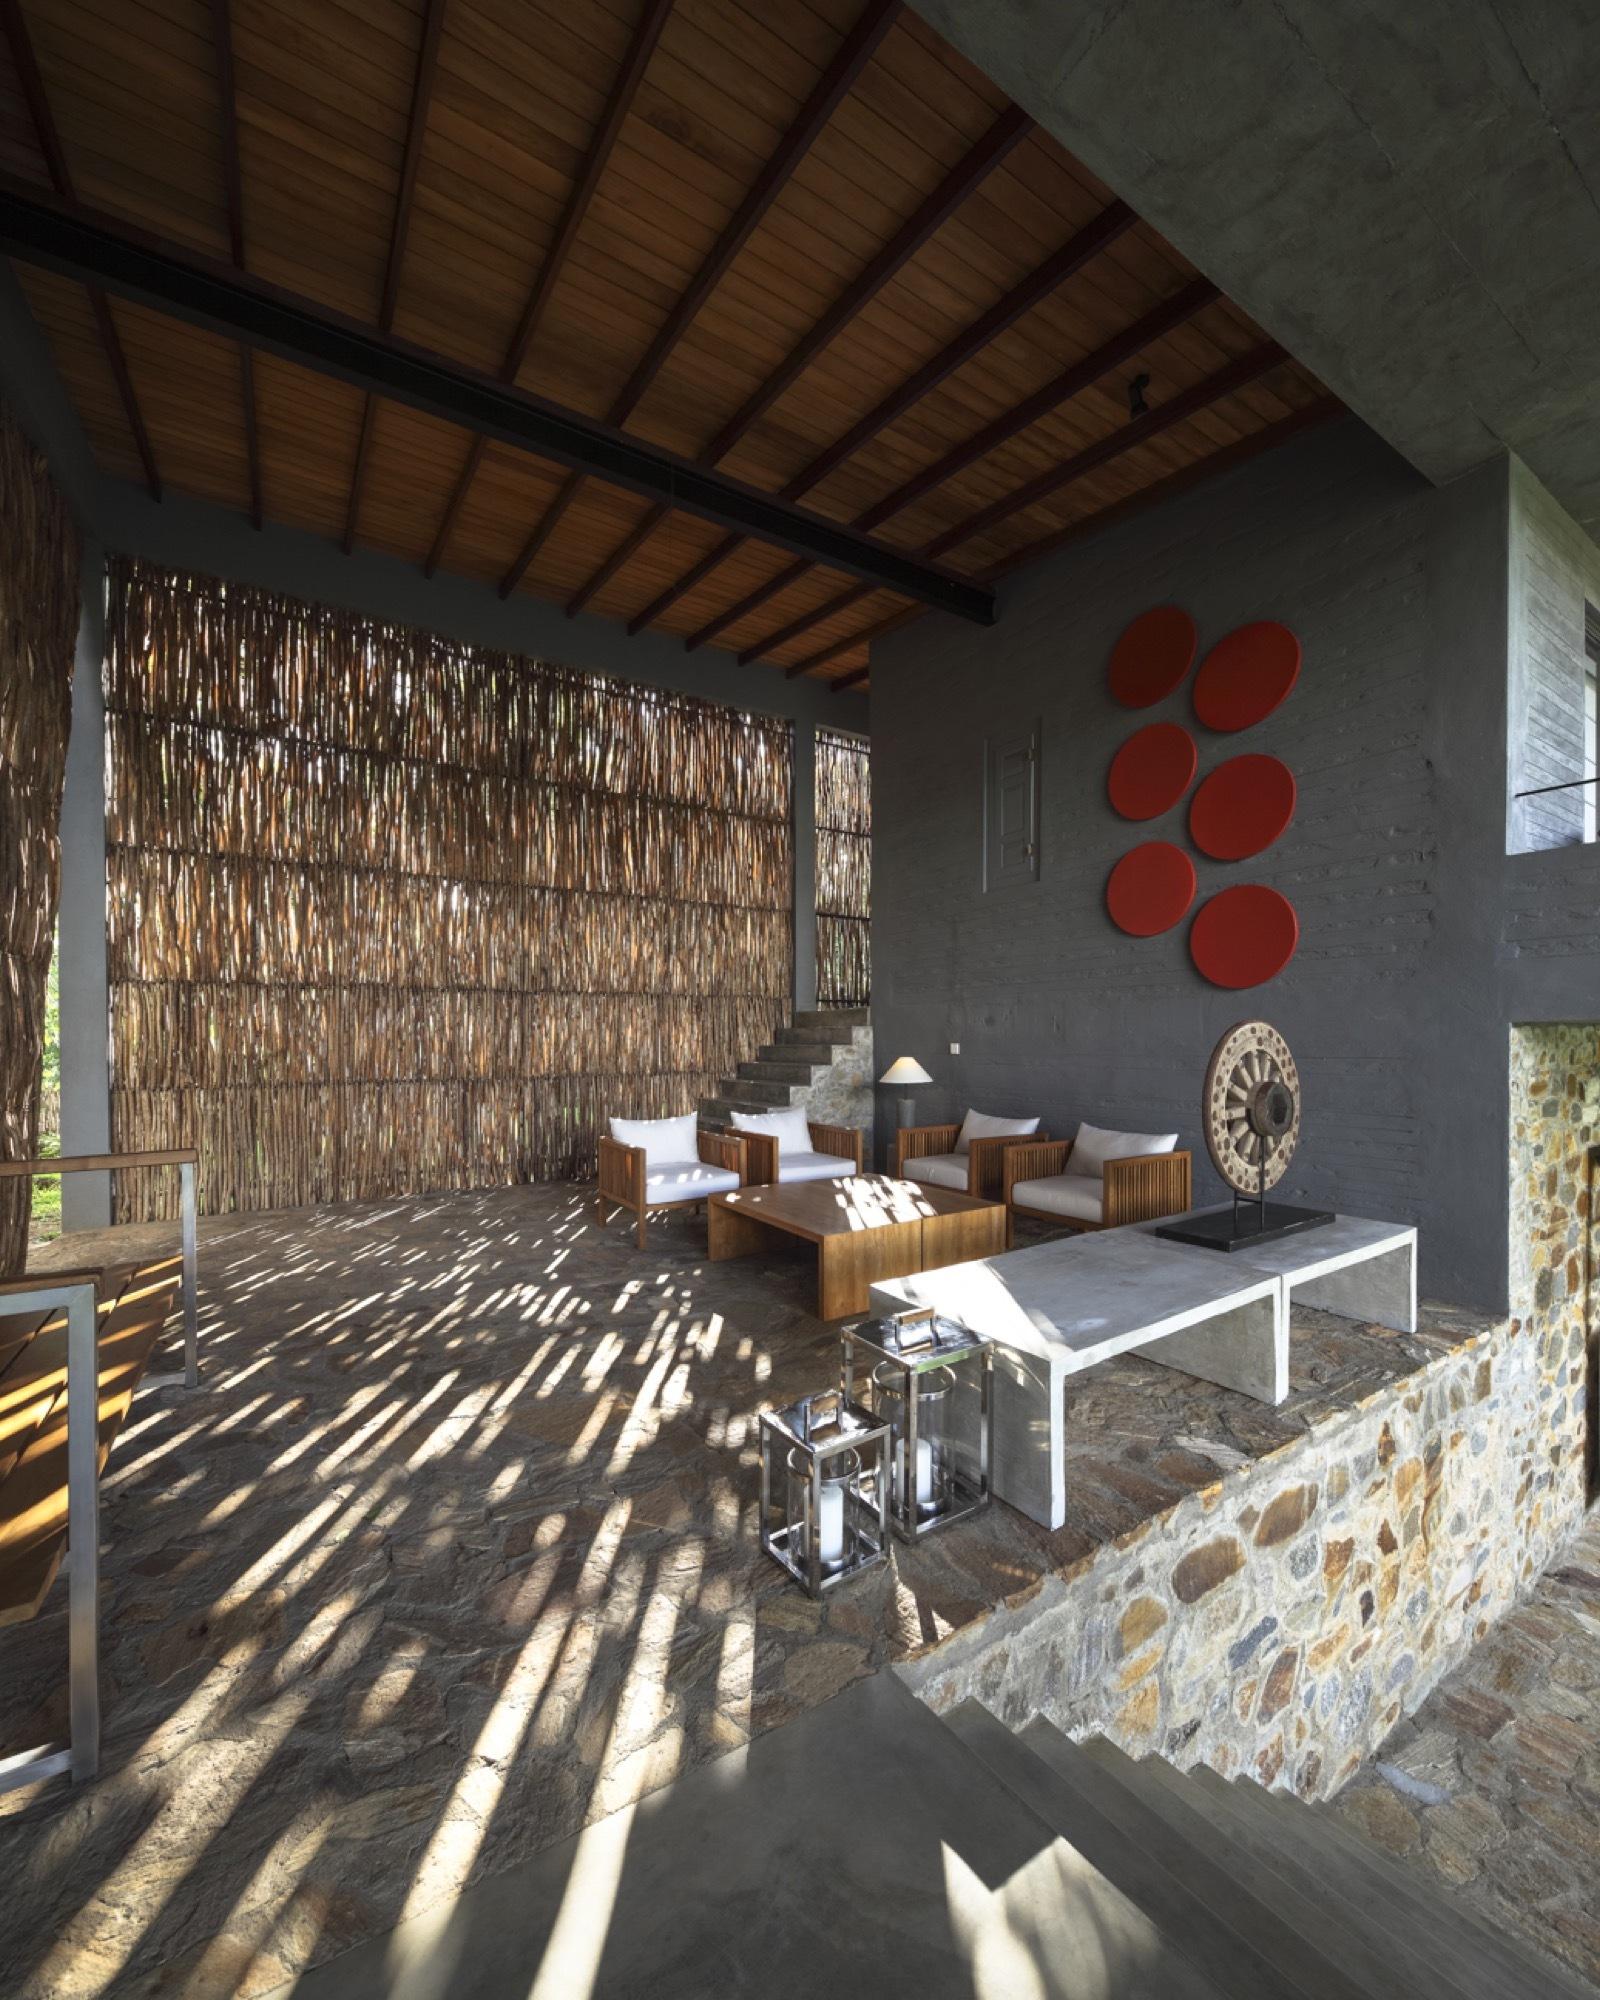 Galeria de Residência Kurundu / Zowa Architects - 1